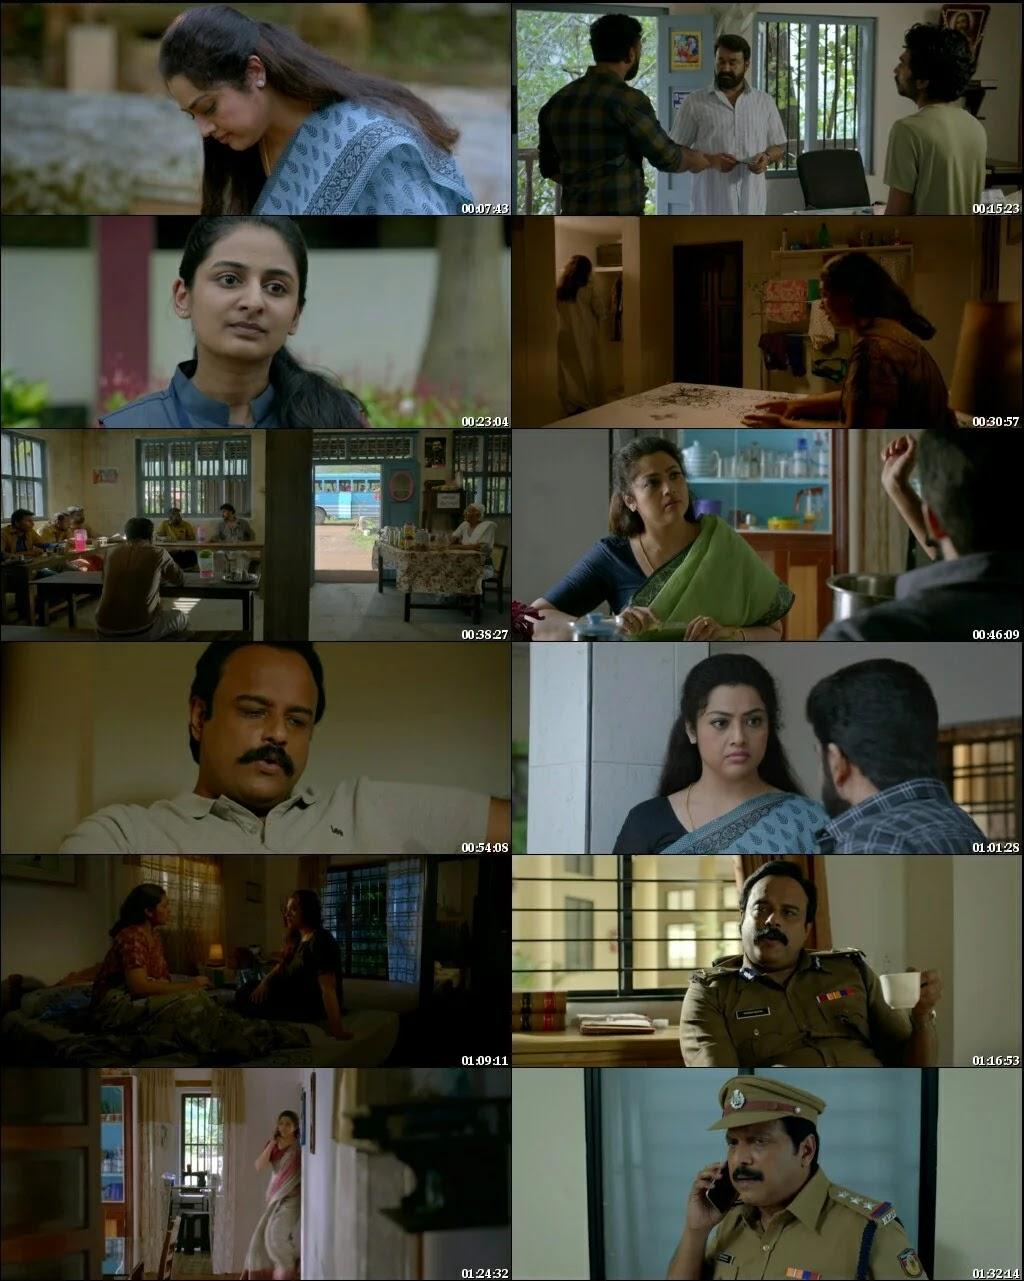 Drushyam 2 (2021) Hindi Dubbed Movie Free Download